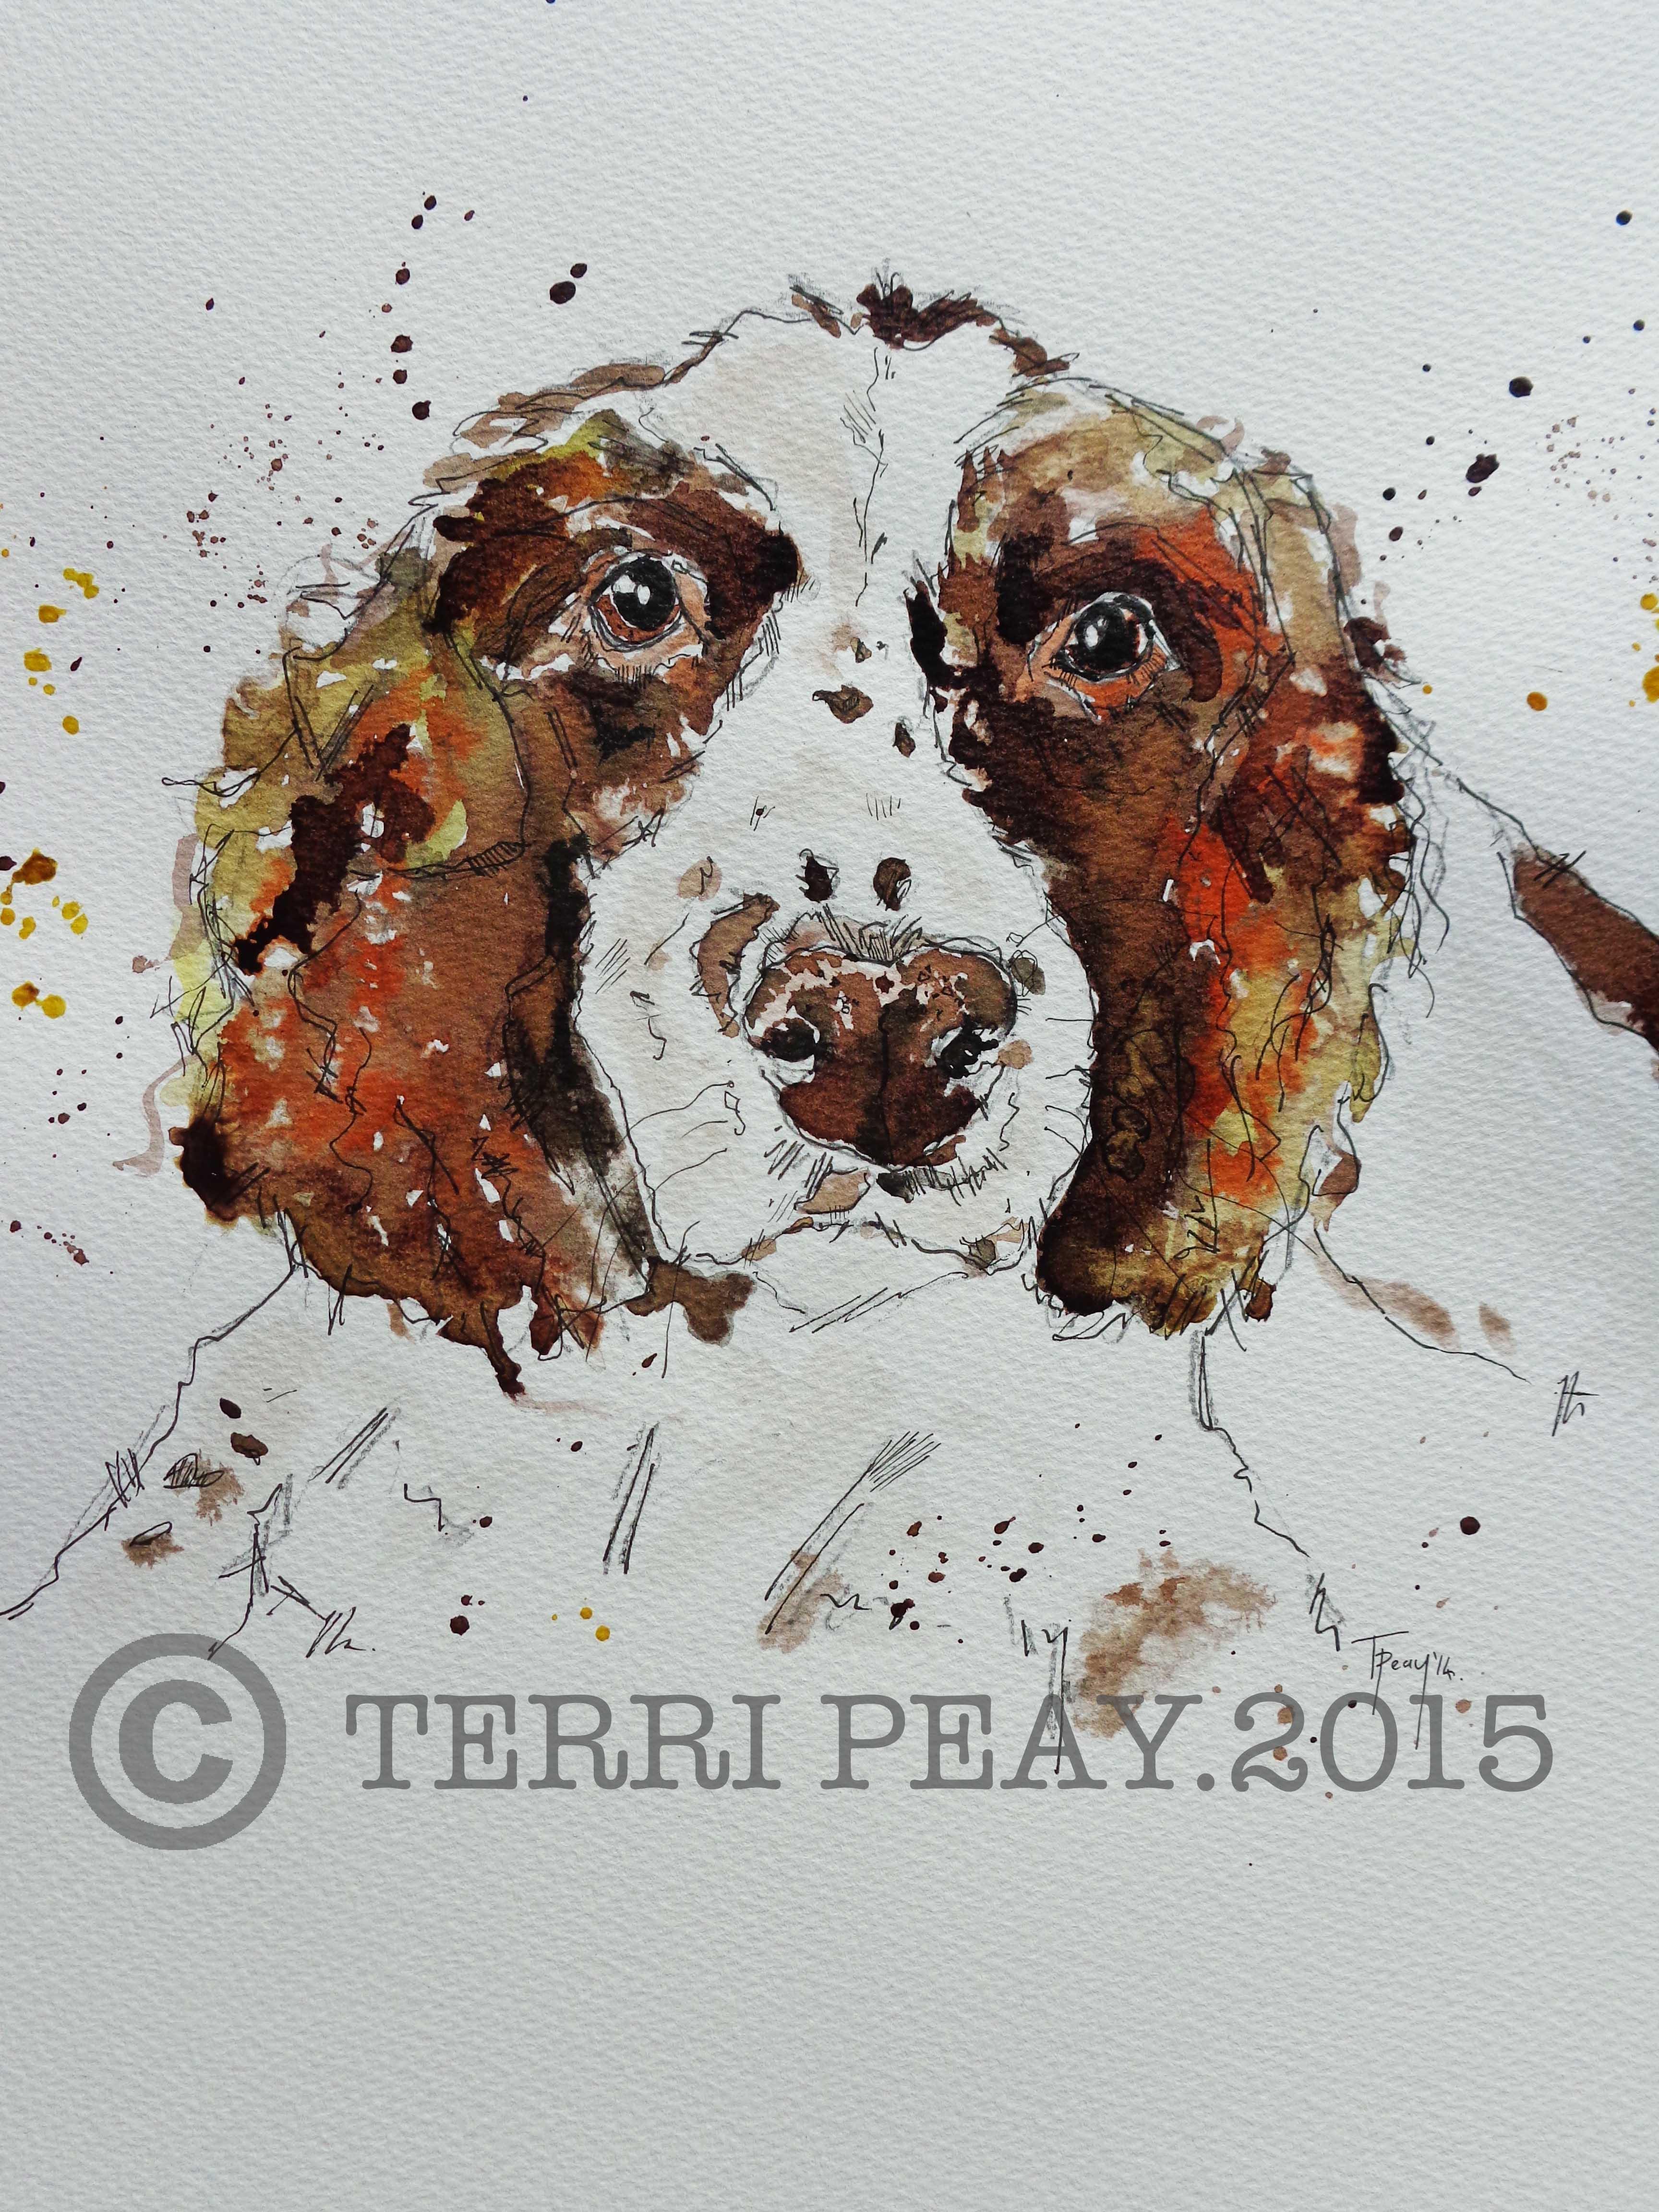 'Spaniel' By Terri Peay